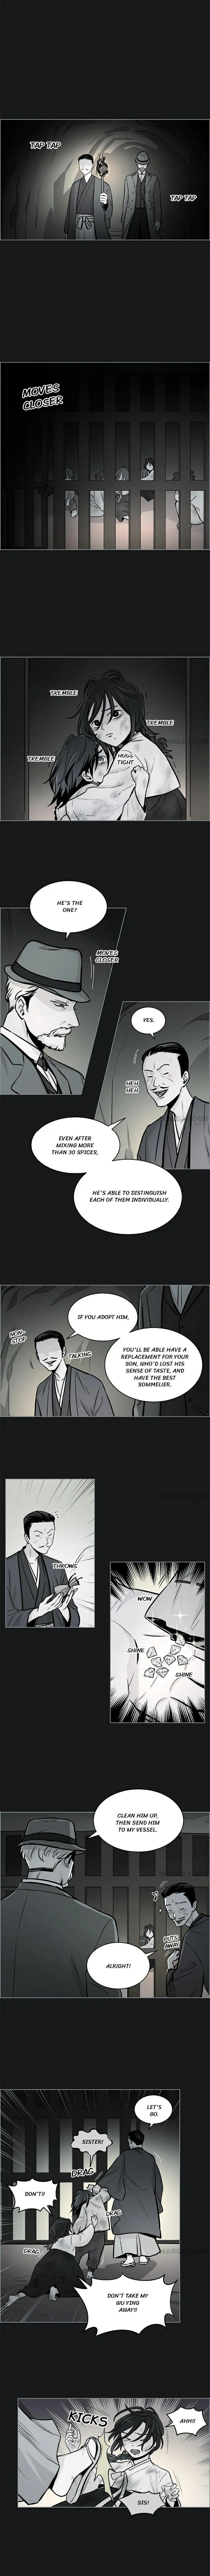 https://manga.mangadogs.com/comics/pic2/31/32927/971782/5b18e1a3e2092783aea4b1aa4a894d8a.jpg Page 1